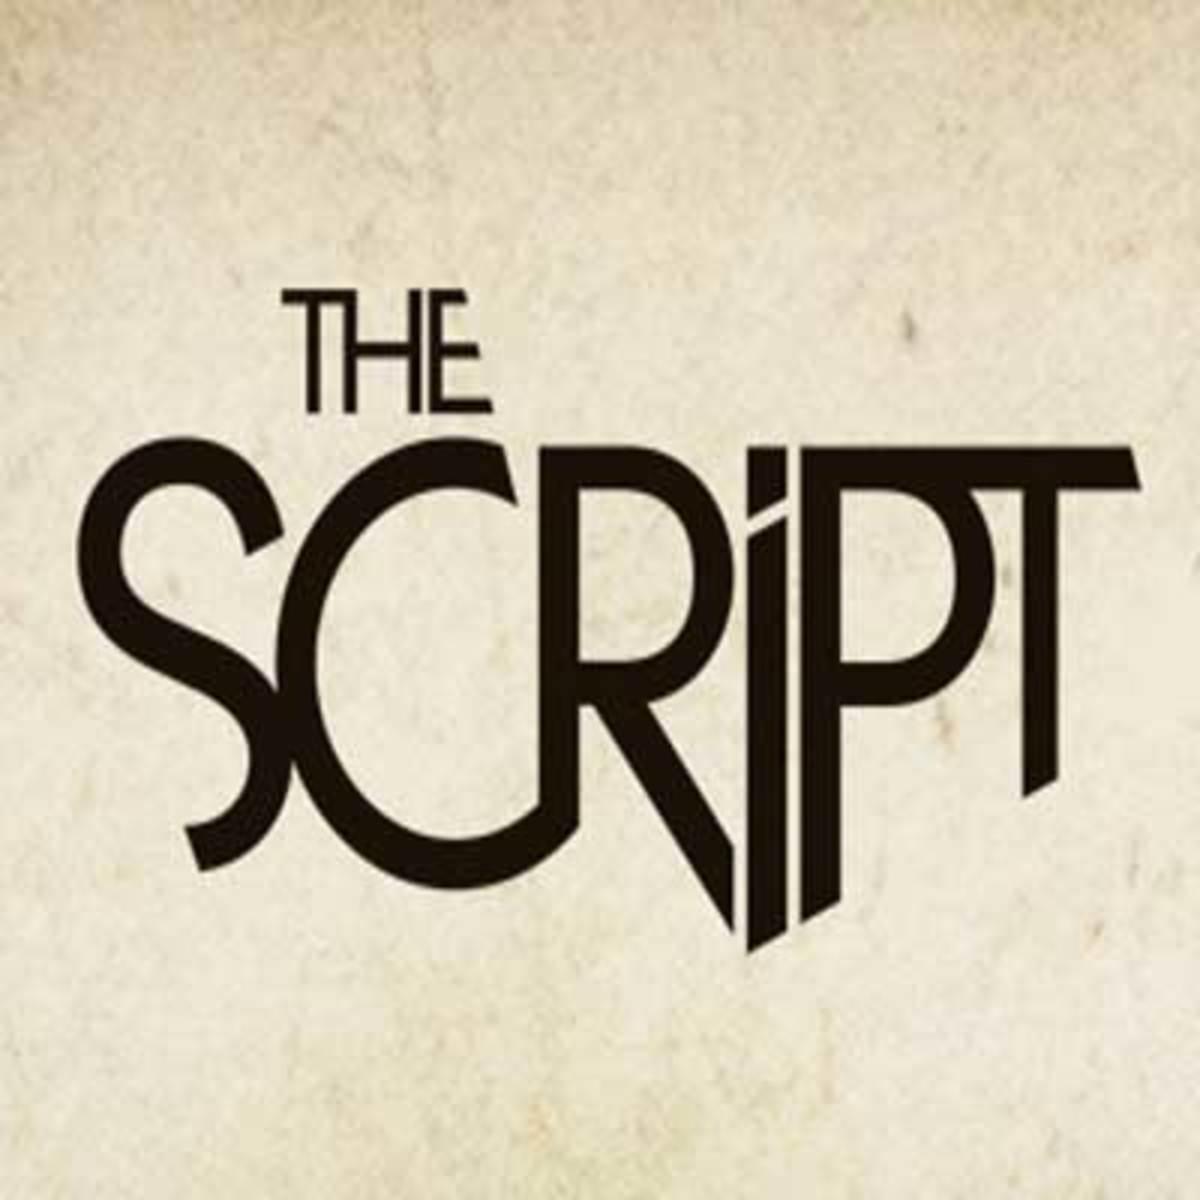 thescript.jpg